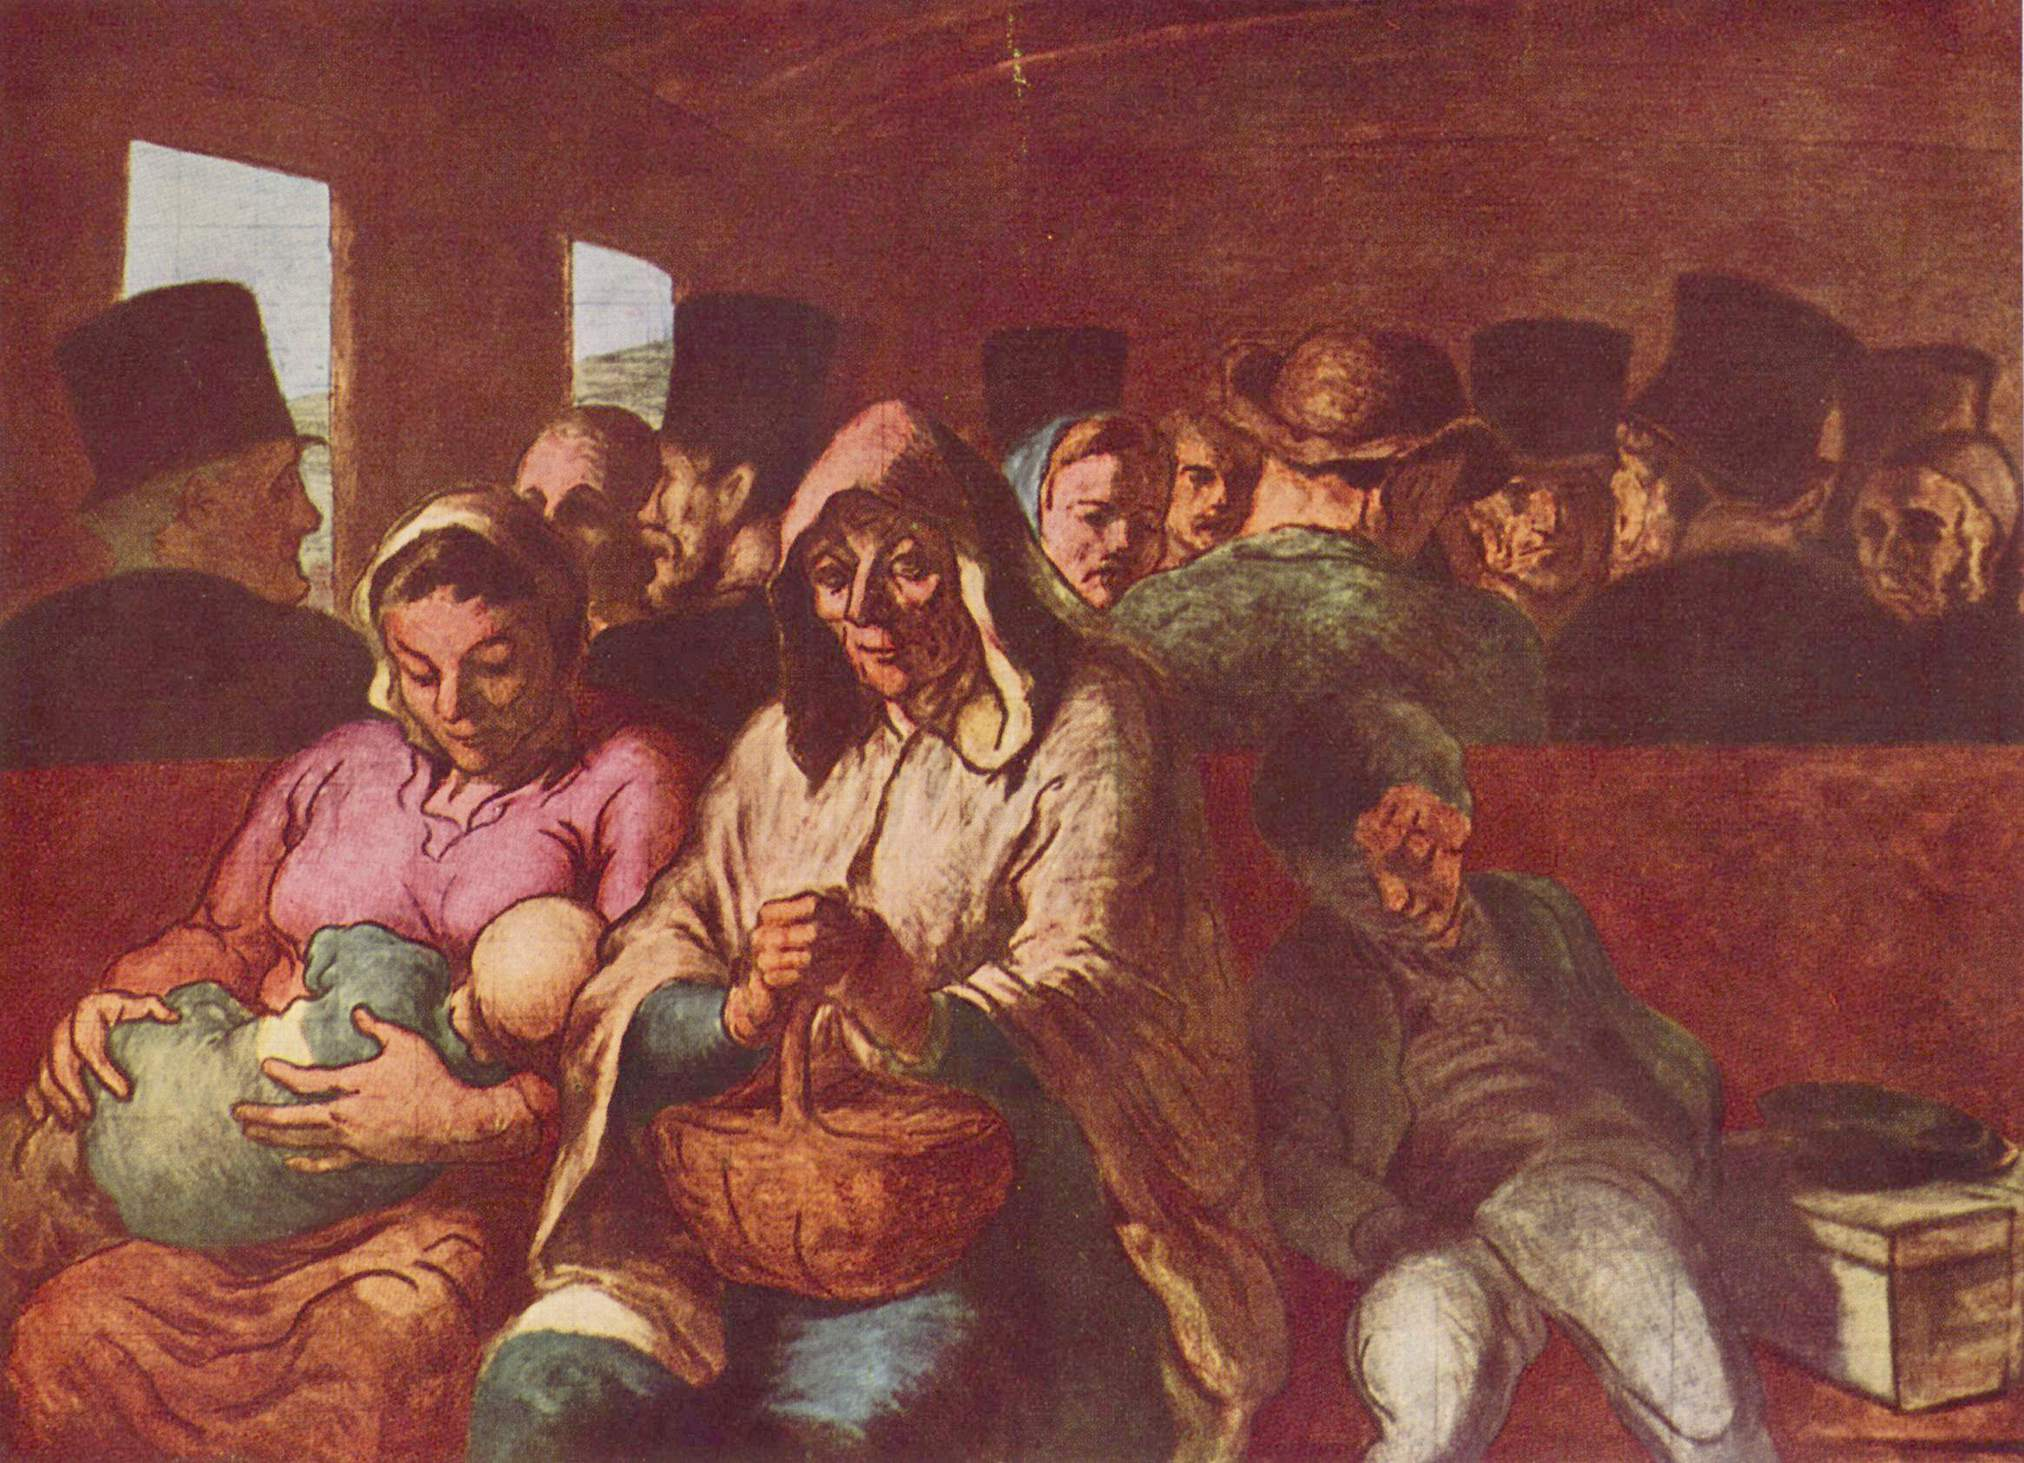 Honoré_Daumier_001